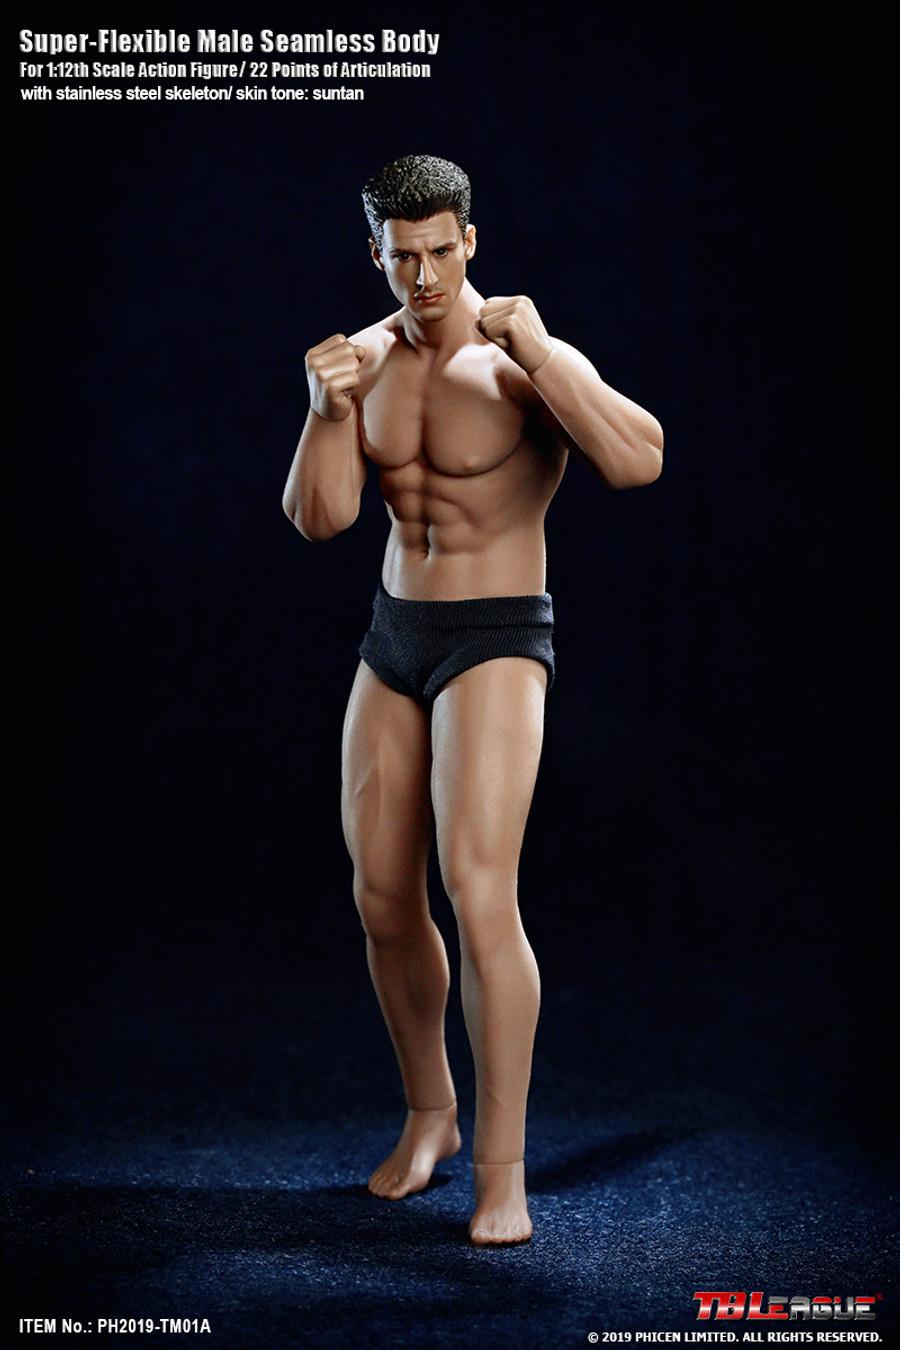 TBLeague - 1/12 Super Flexible Male Seamless Body - TM01A